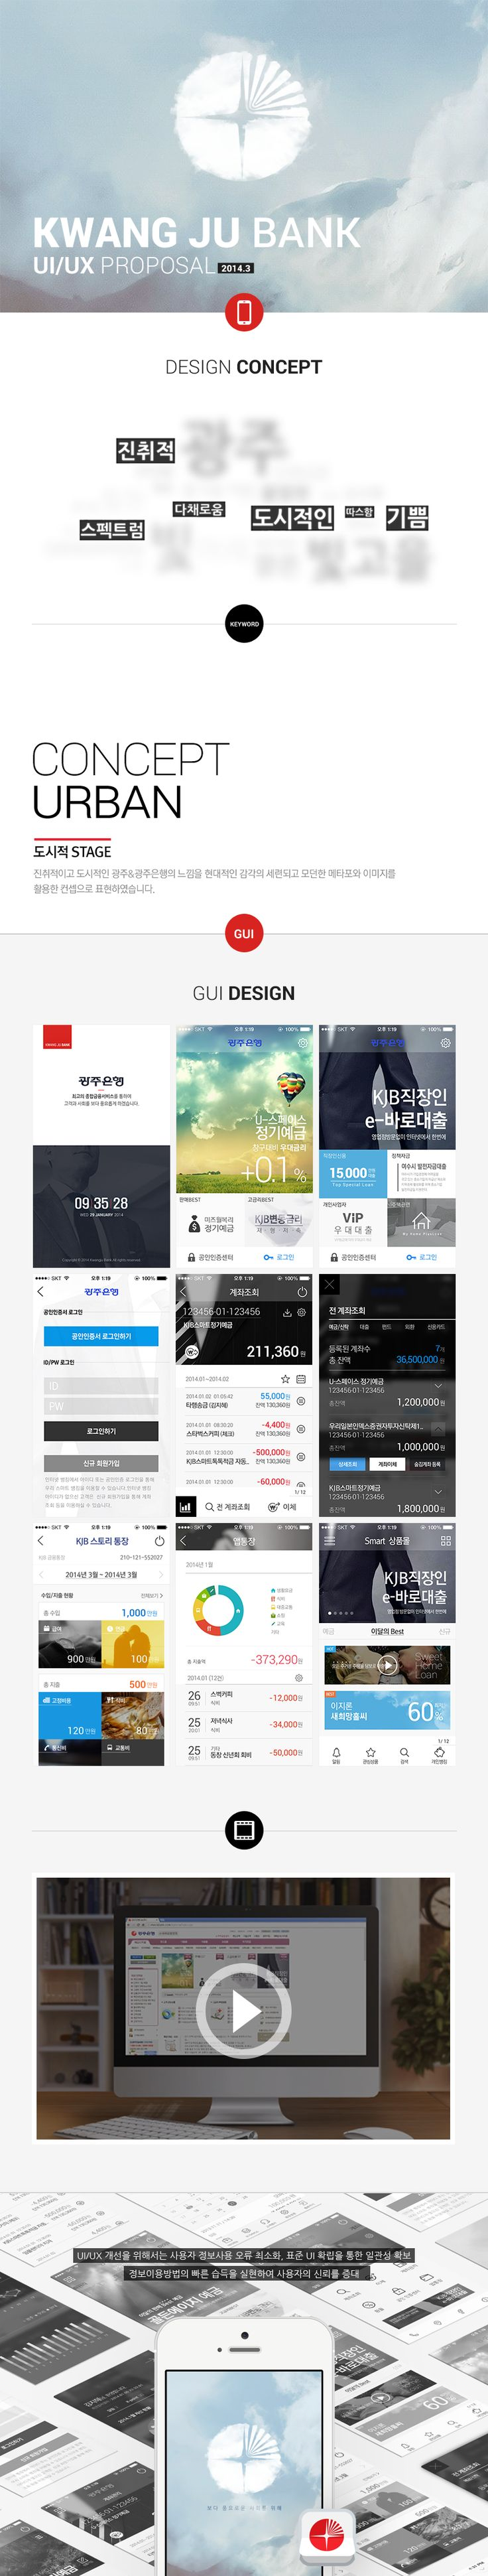 115 best mobile banking images on pinterest interface design user